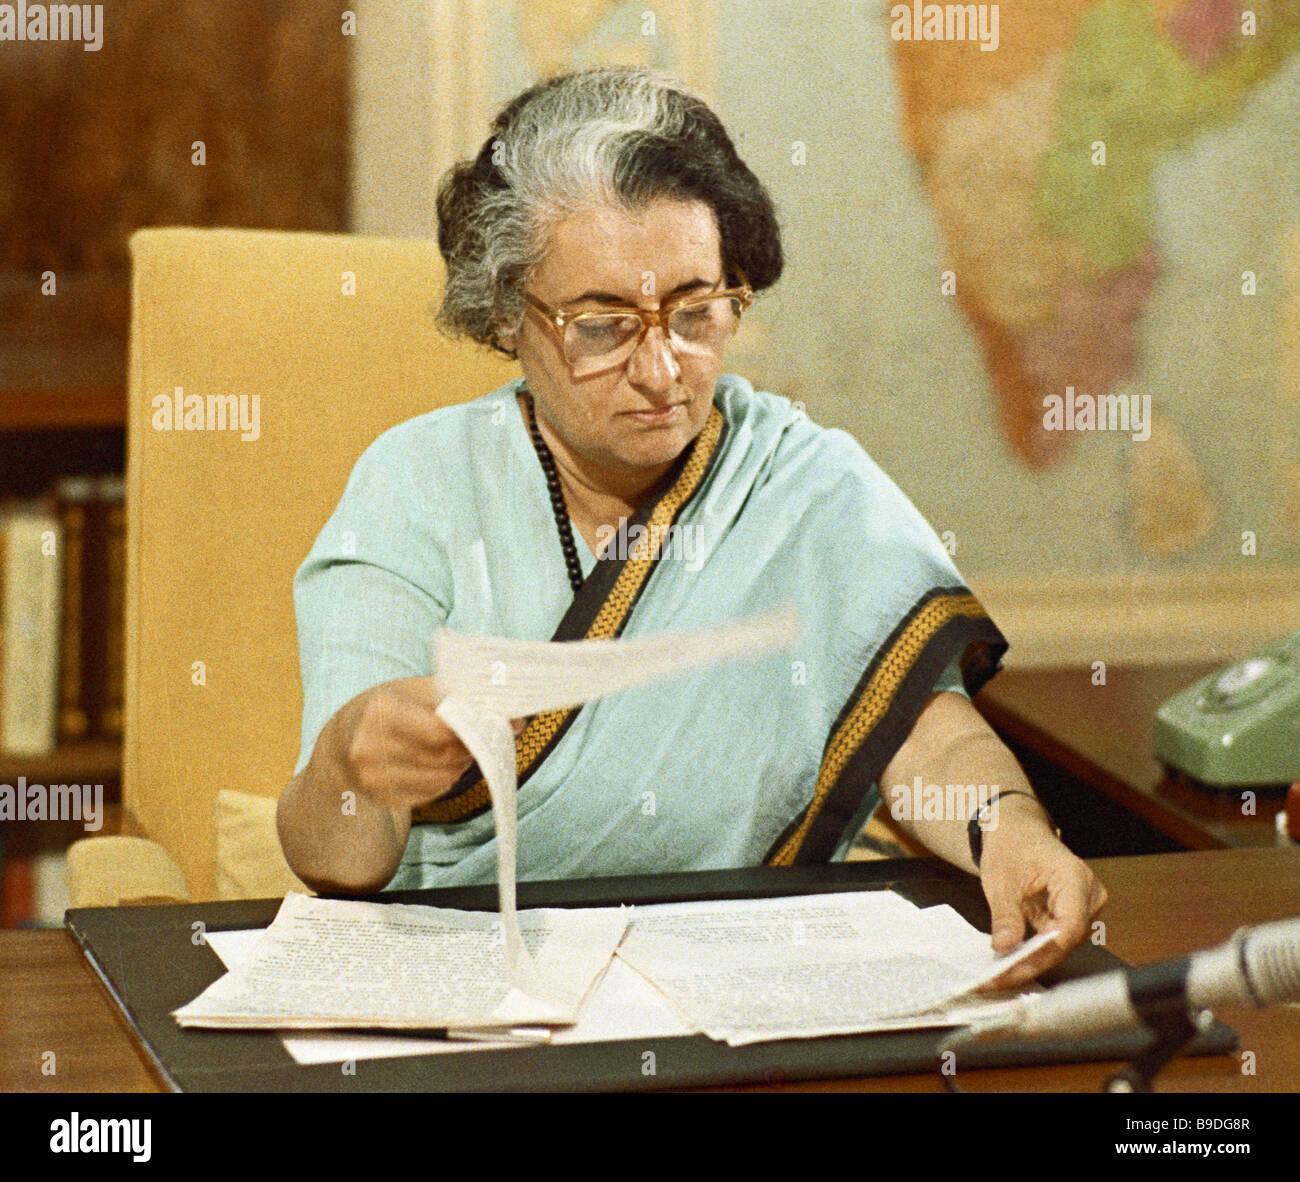 Indira Gandhi Prime Minister of India - Stock Image